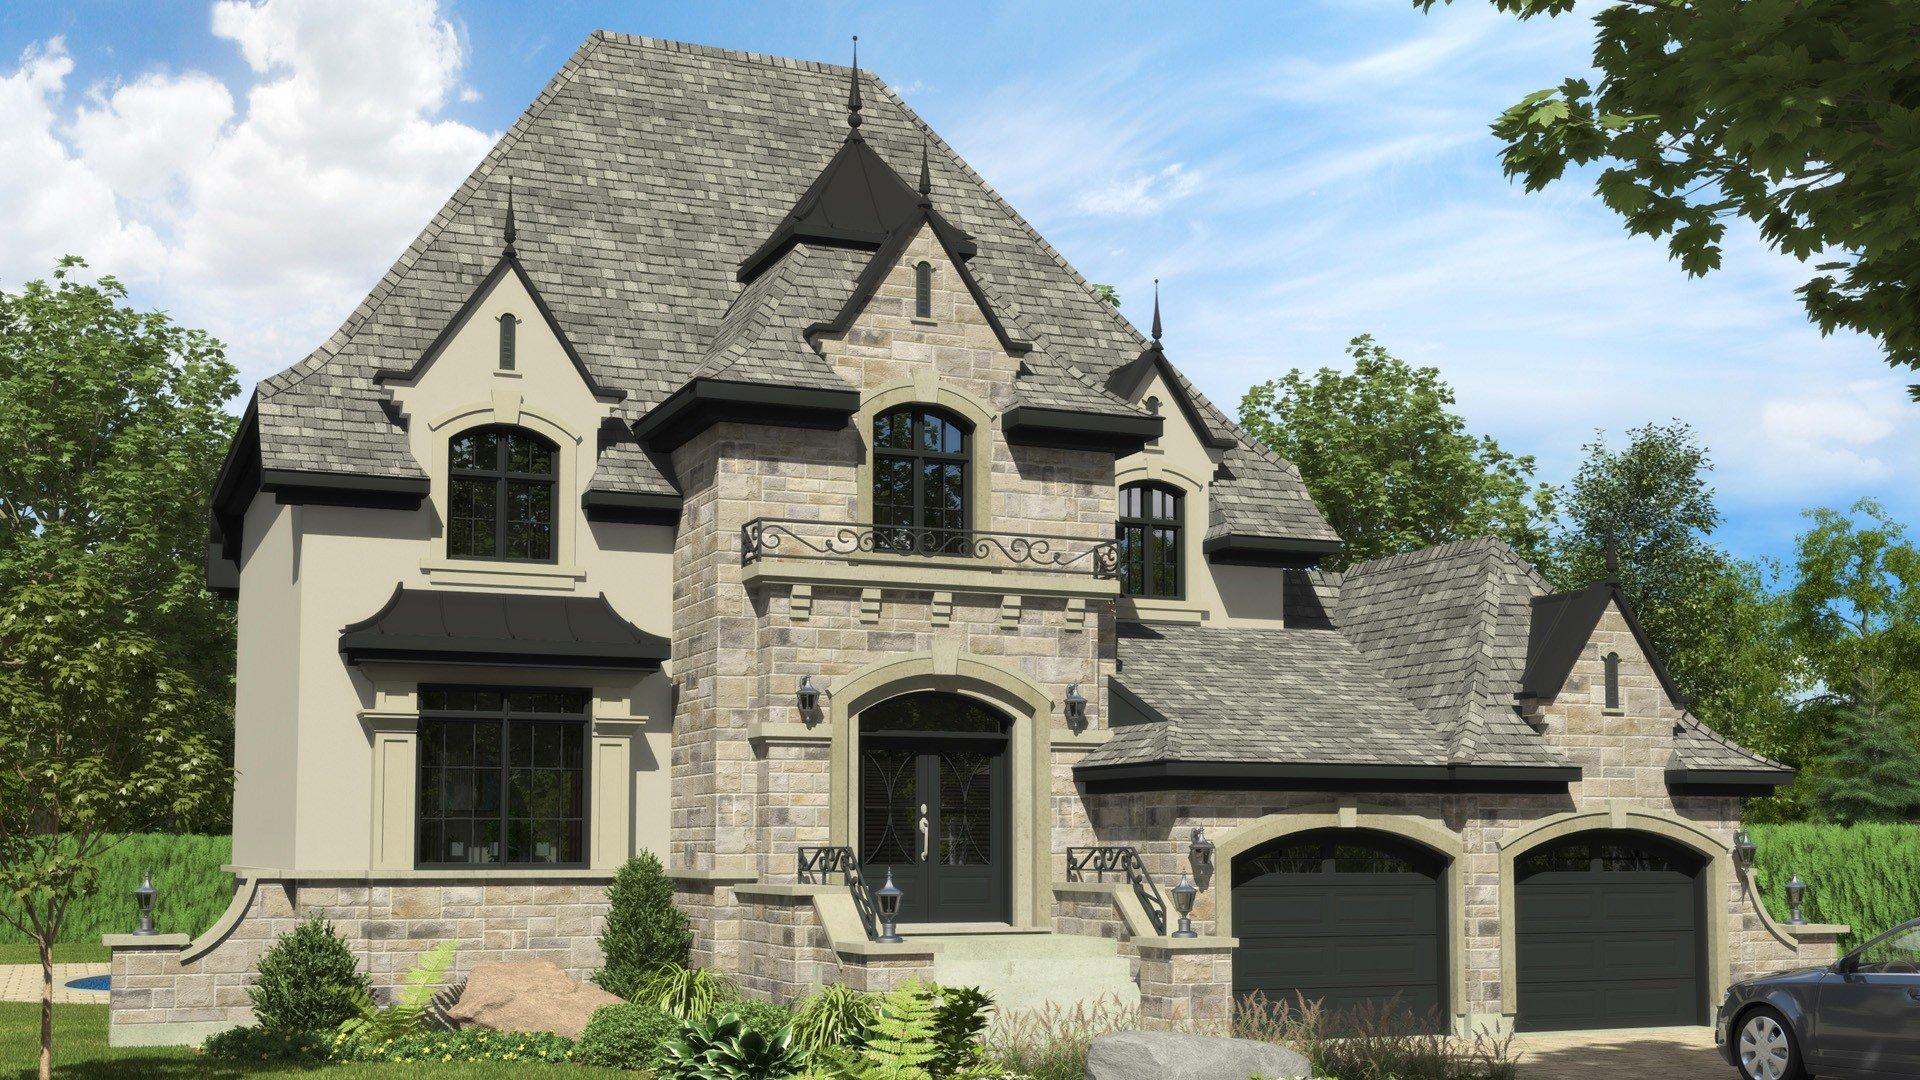 Cottage_Chateaux_Chateaubourg_Luxury home_Domicilde prestige_Domicil